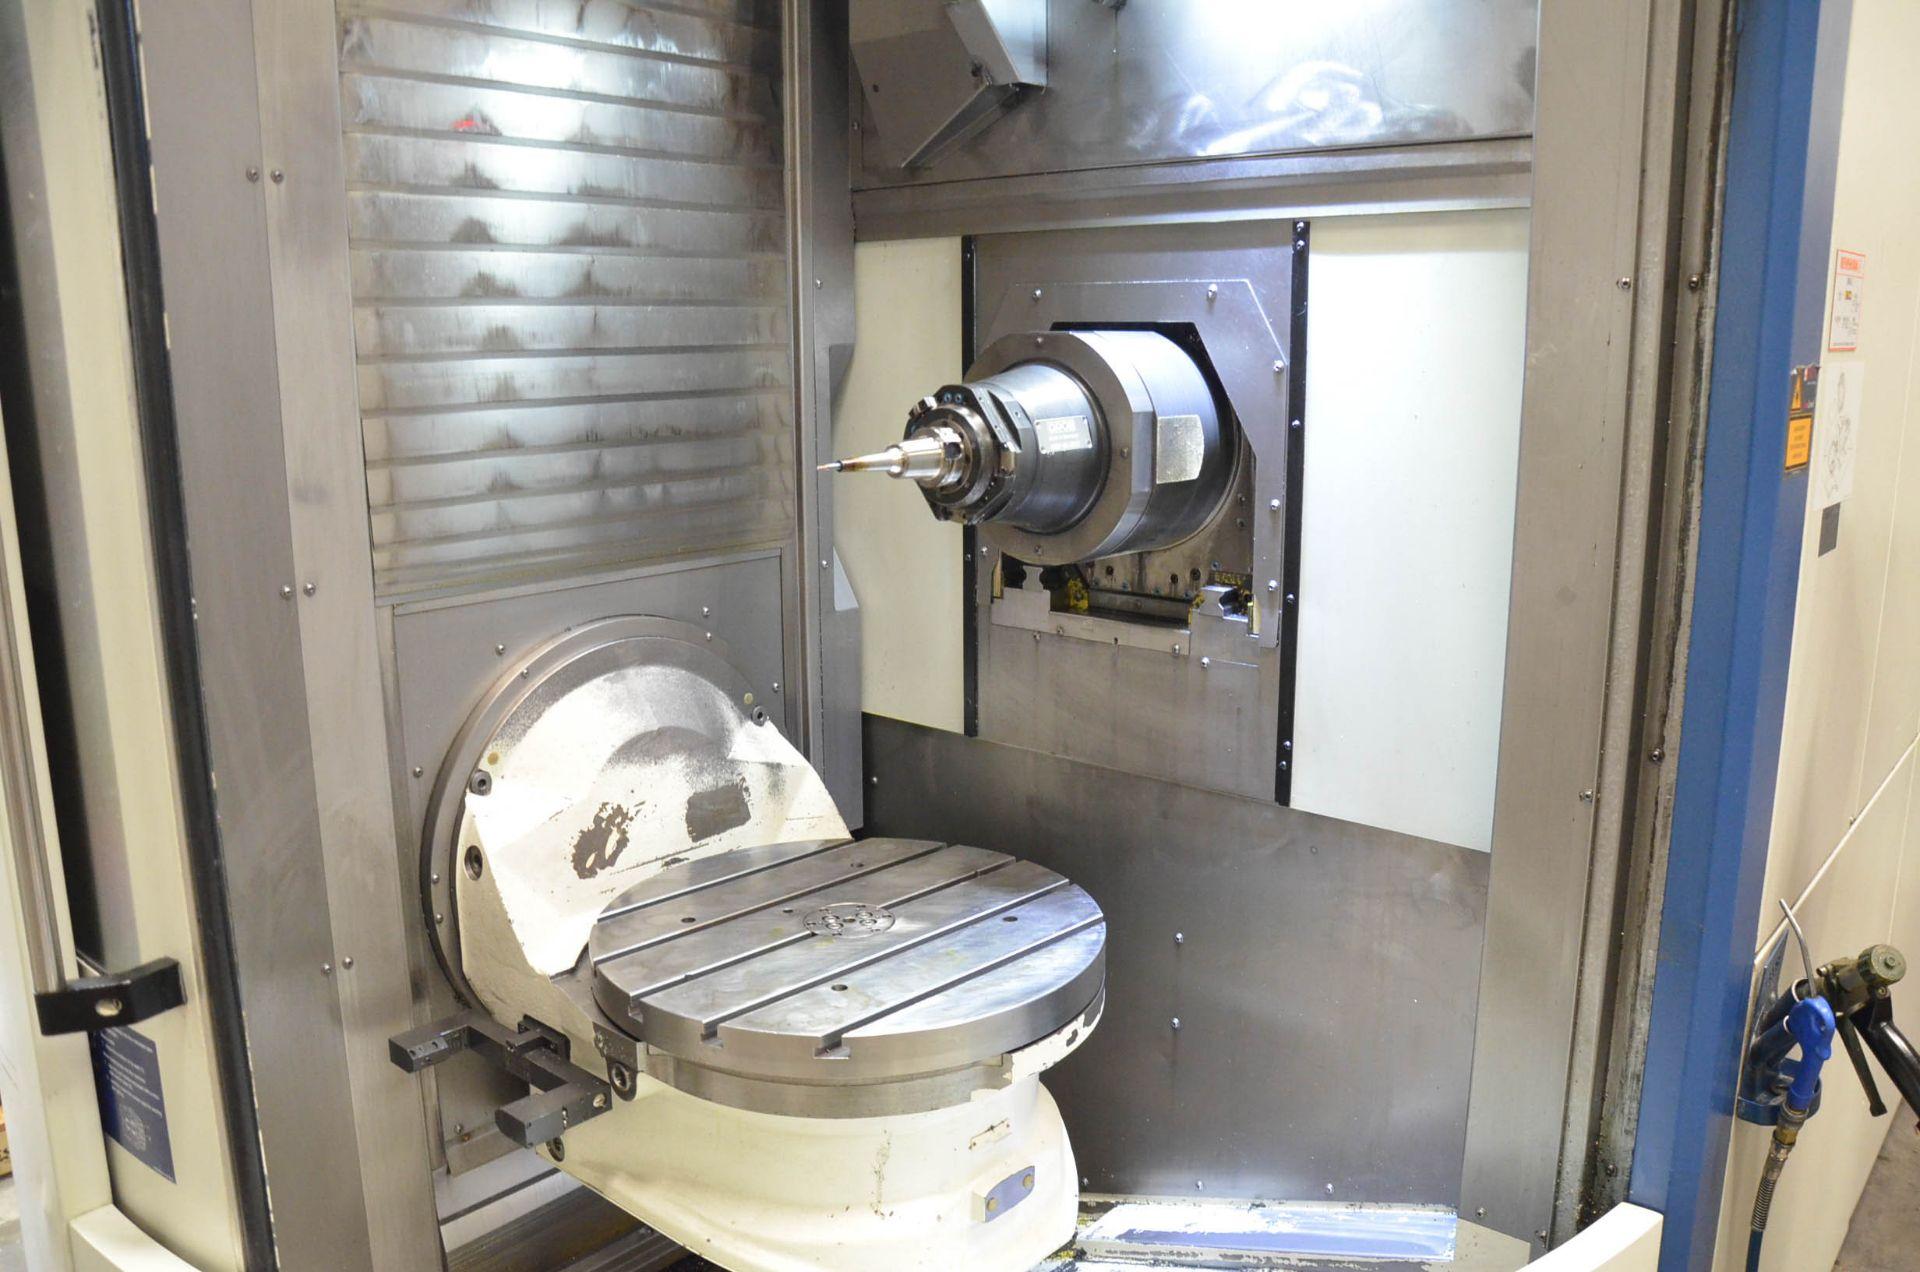 "GROB (2012) G350 5-AXIS CNC MACHINING CENTER WITH HEIDENHAIN ITNC 530 CNC CONTROL, 22.25"" DIAMETER - Image 7 of 12"